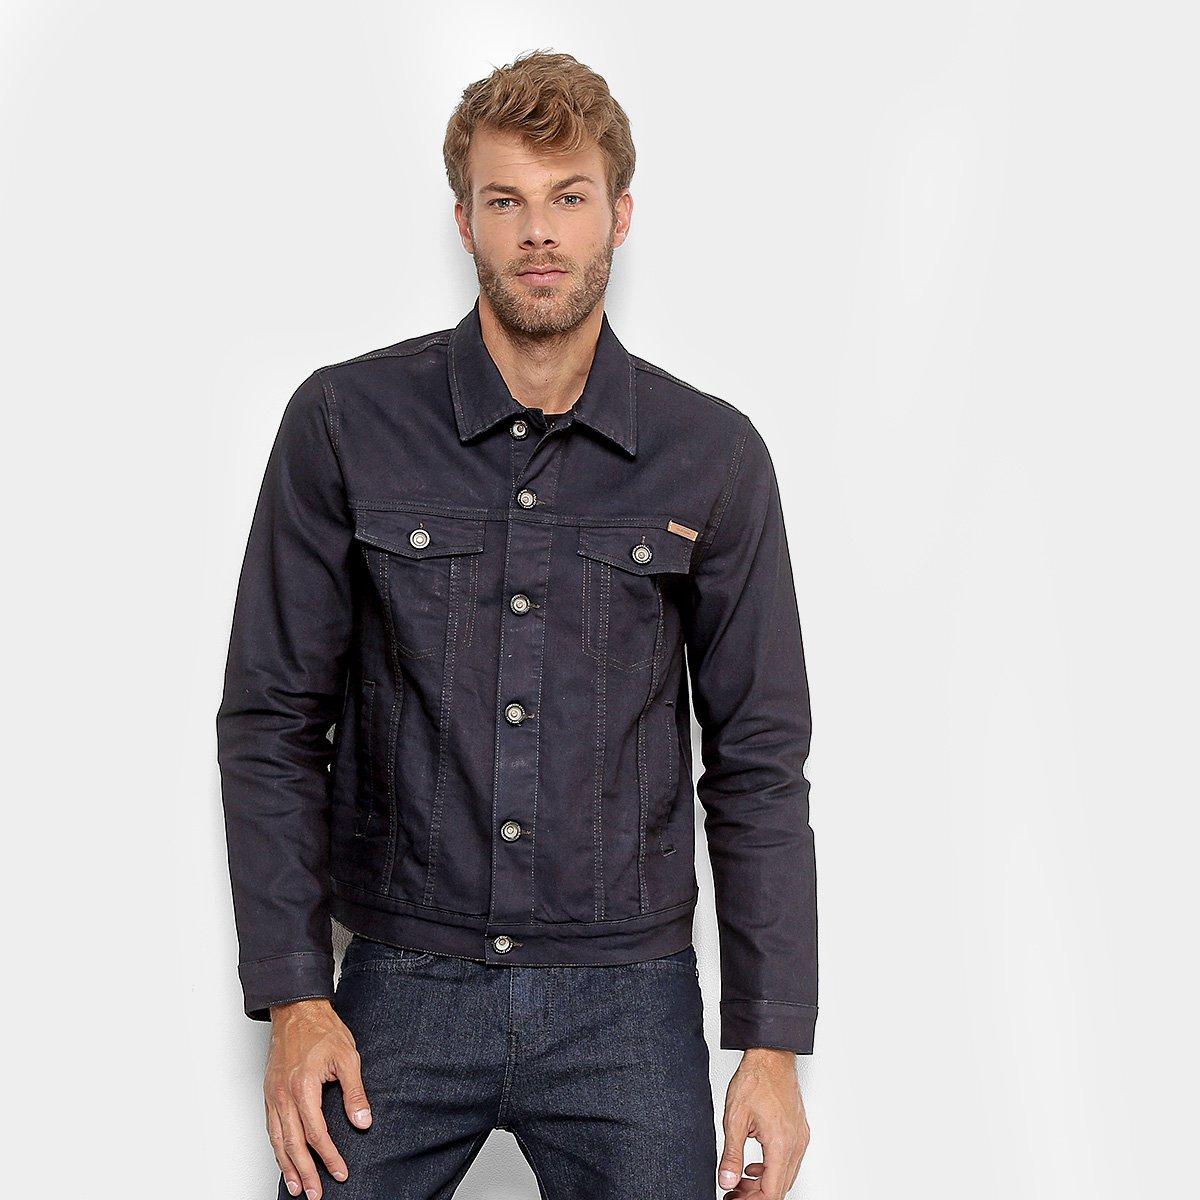 6cd5e360c Indigo Jeans Masculina Zattini Compre Colcci Agora Jaqueta qCRwAgg